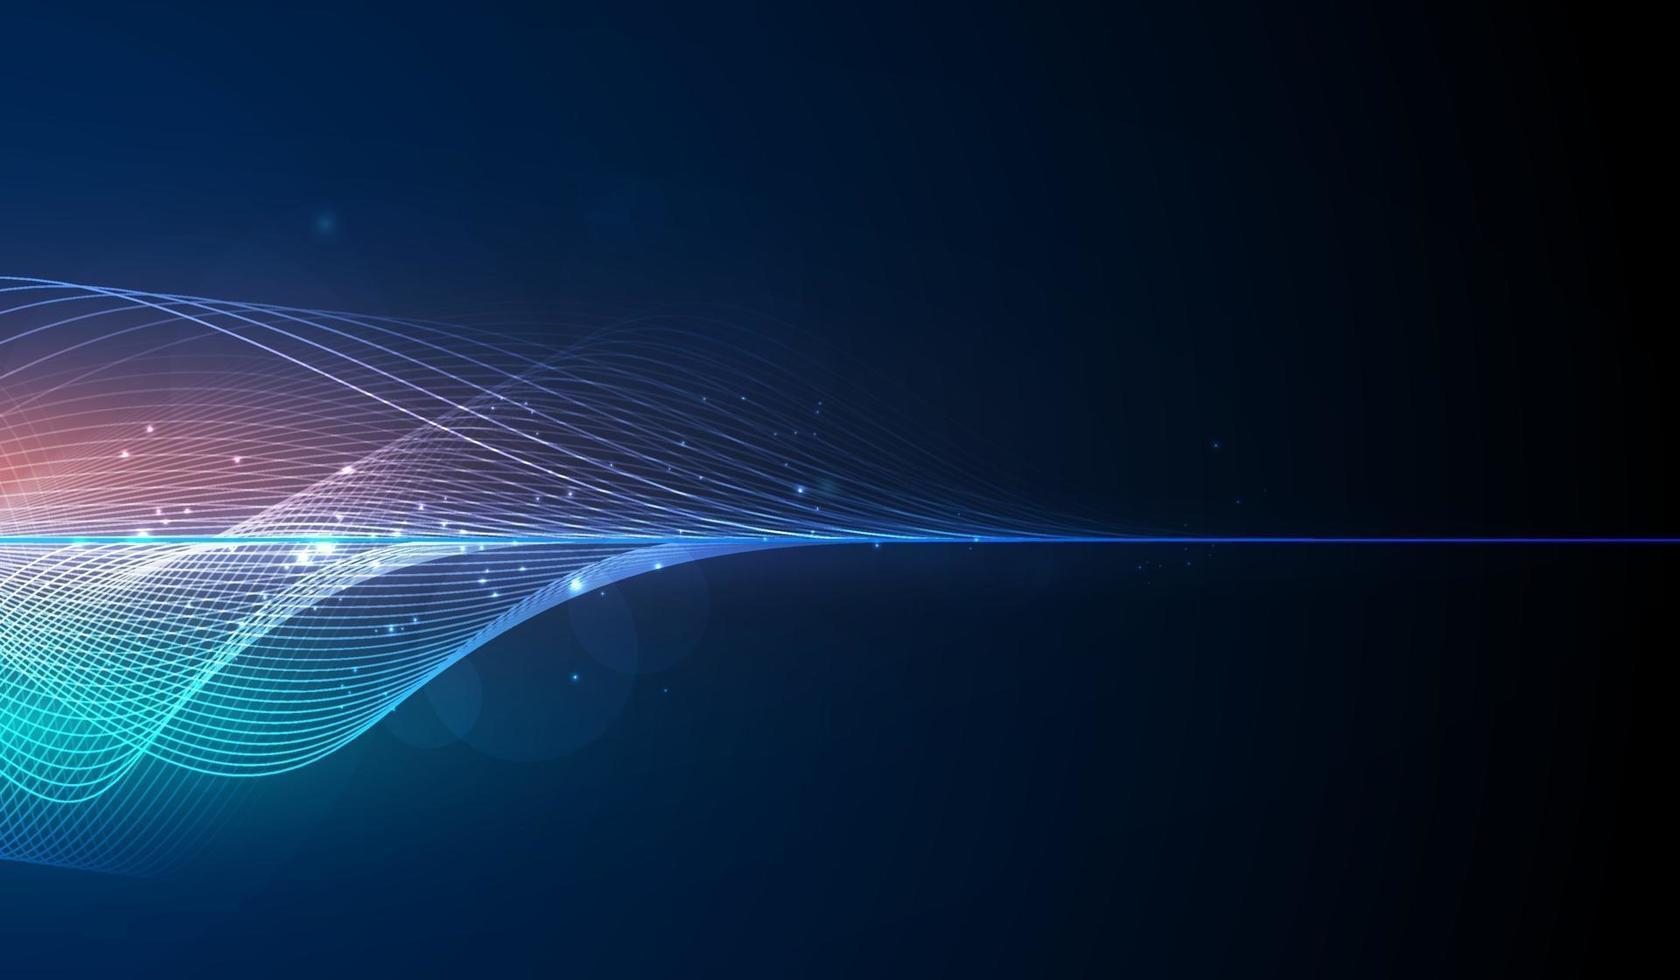 Ecualizador digital azul abstracto, vector de elemento de patrón de onda de sonido